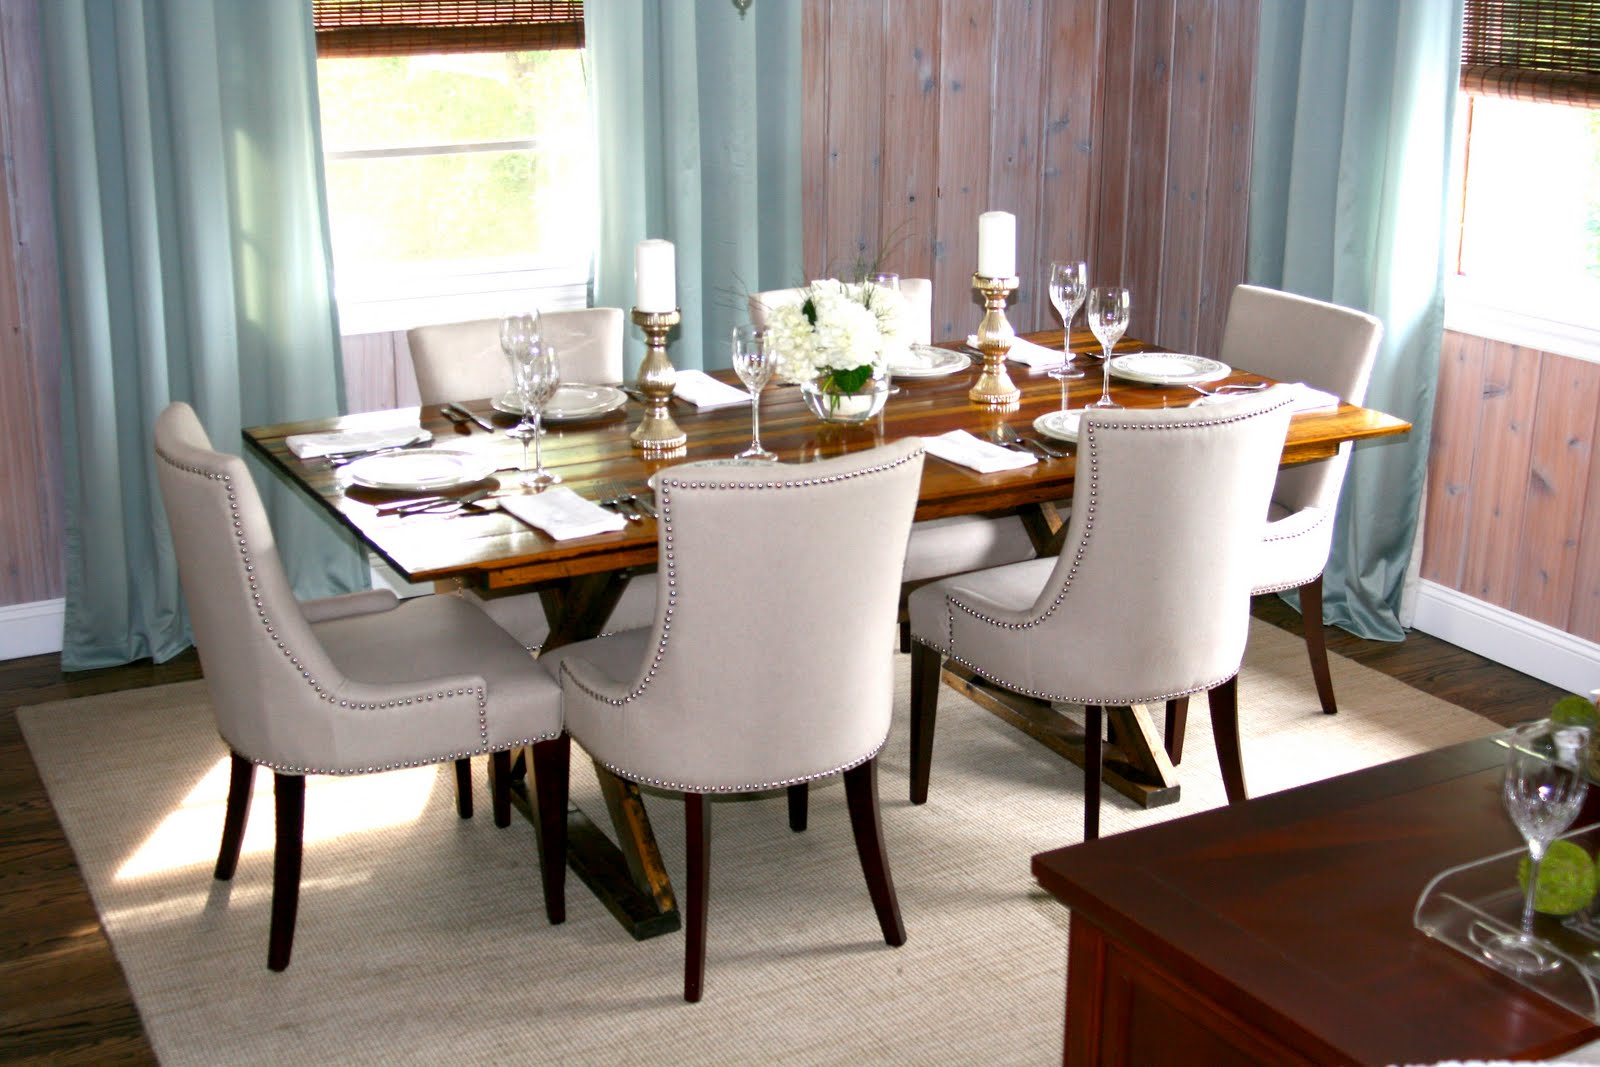 justatouchofgray blogspot gray kitchen table Dining Room